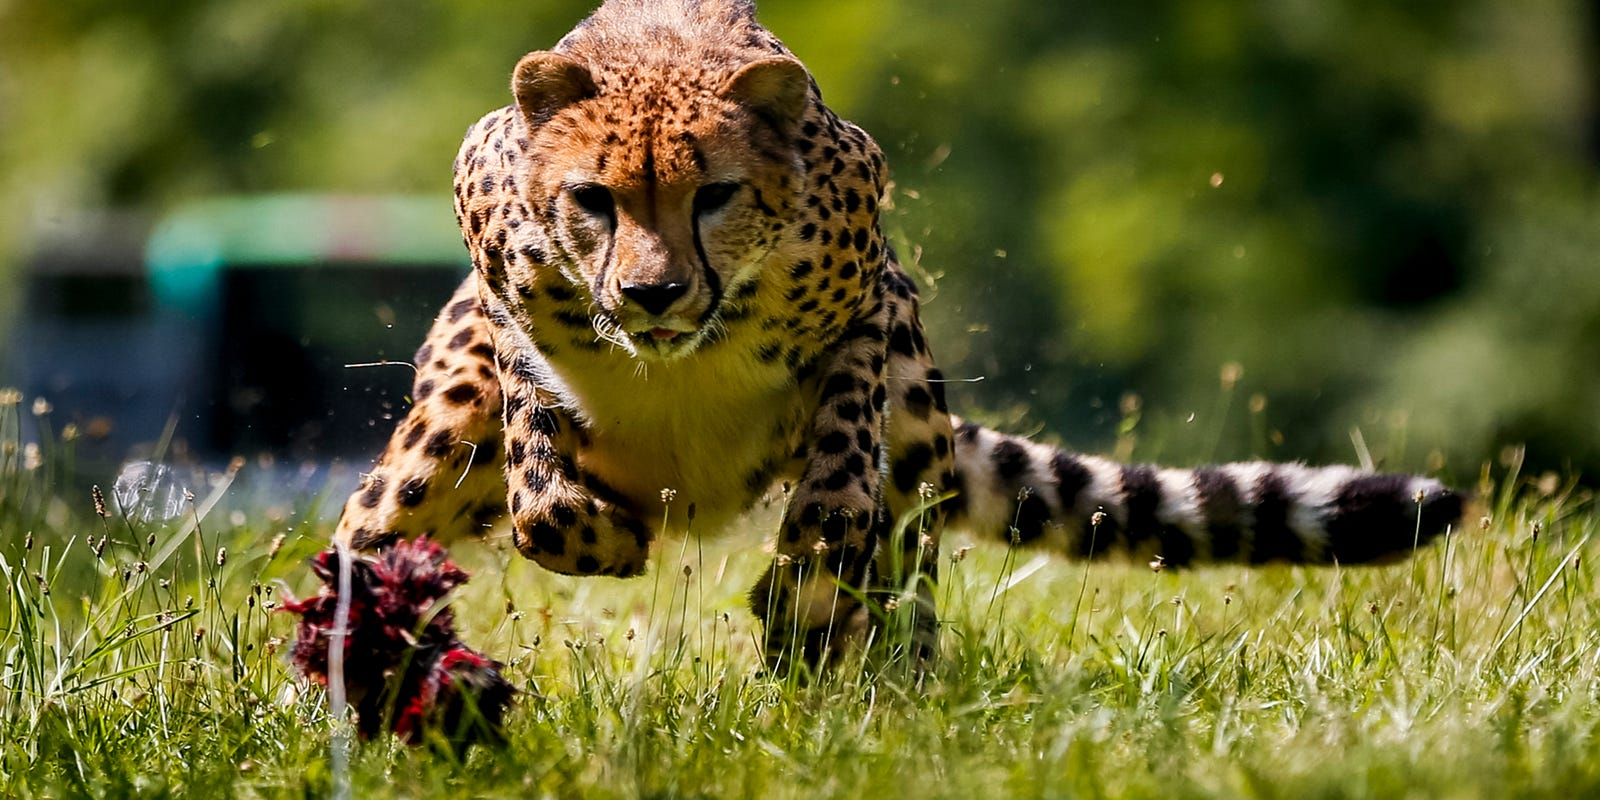 Cheetah run, mountain-man biathlon, prodigal emu: News from around our 50 states